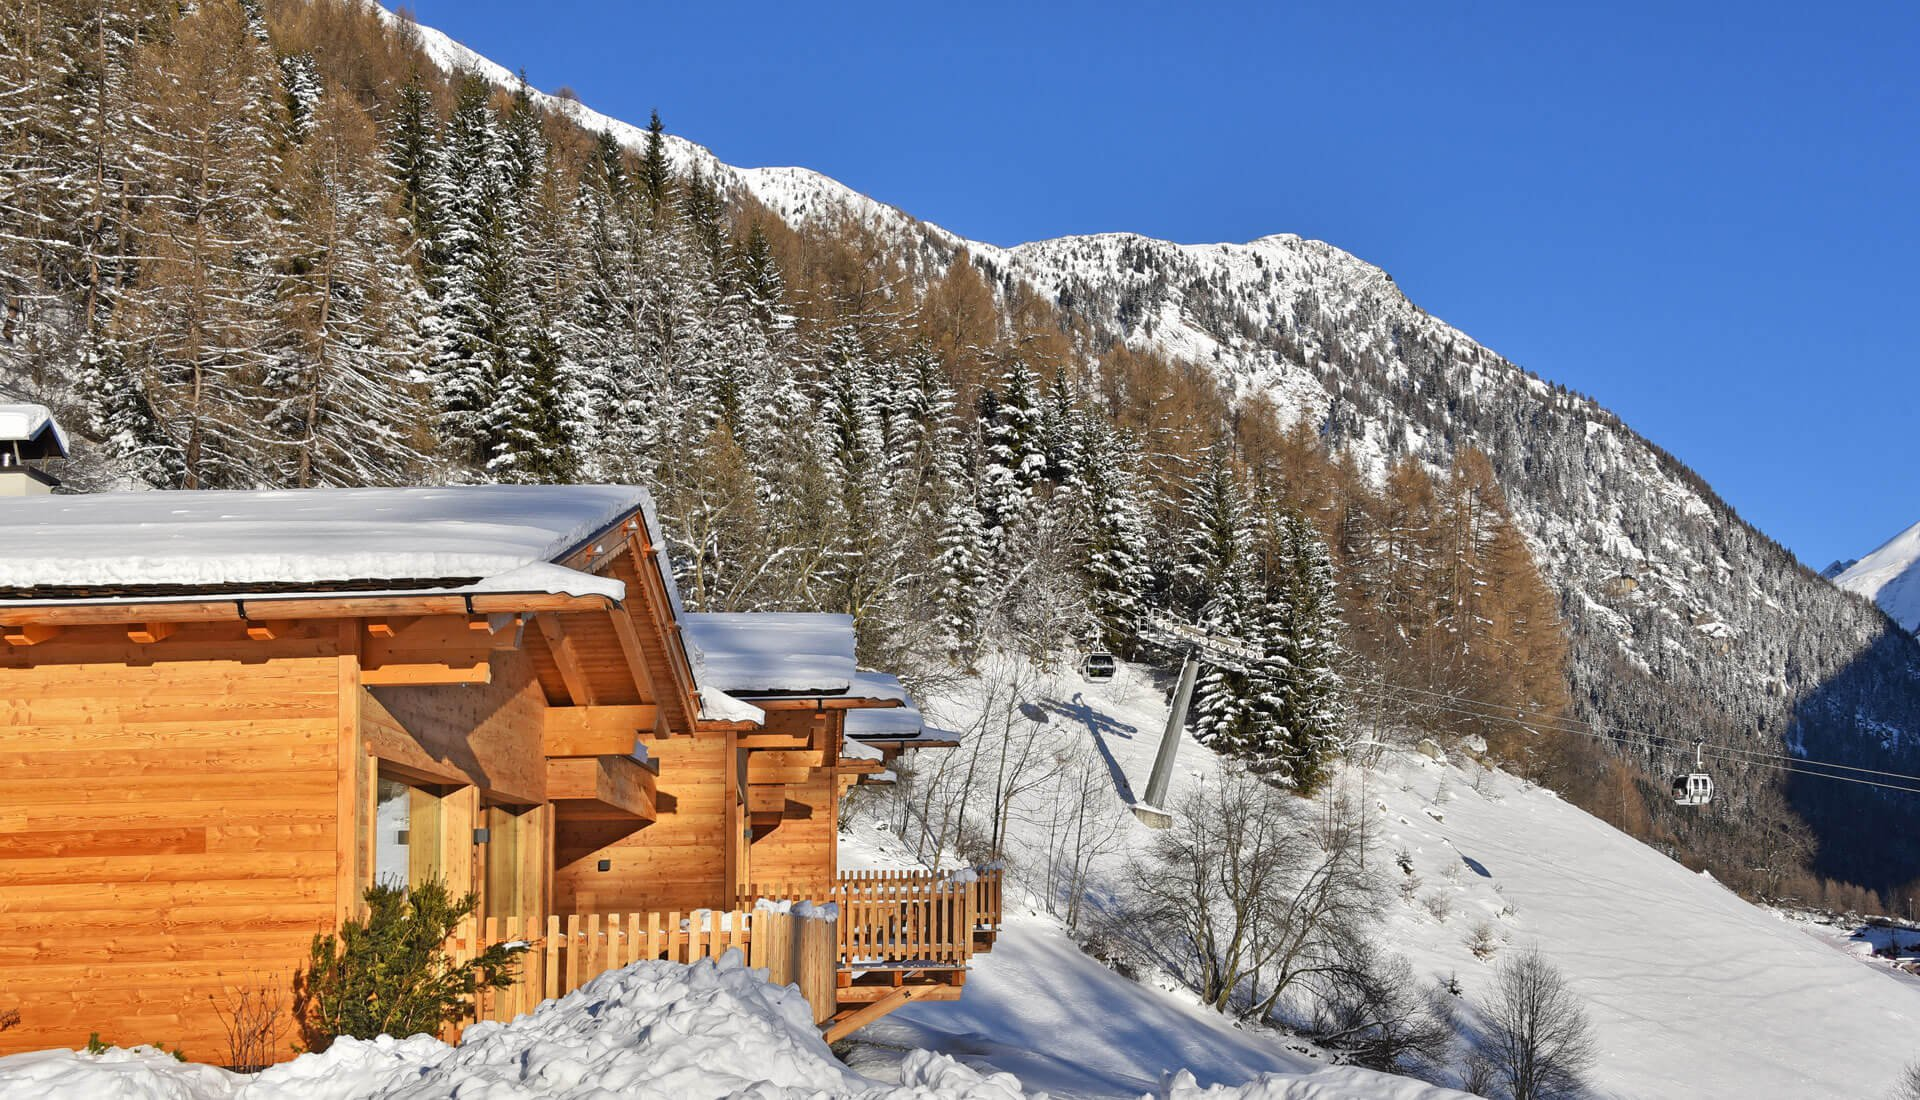 ski-chalets-skigebiet-gitschberg-jochtal